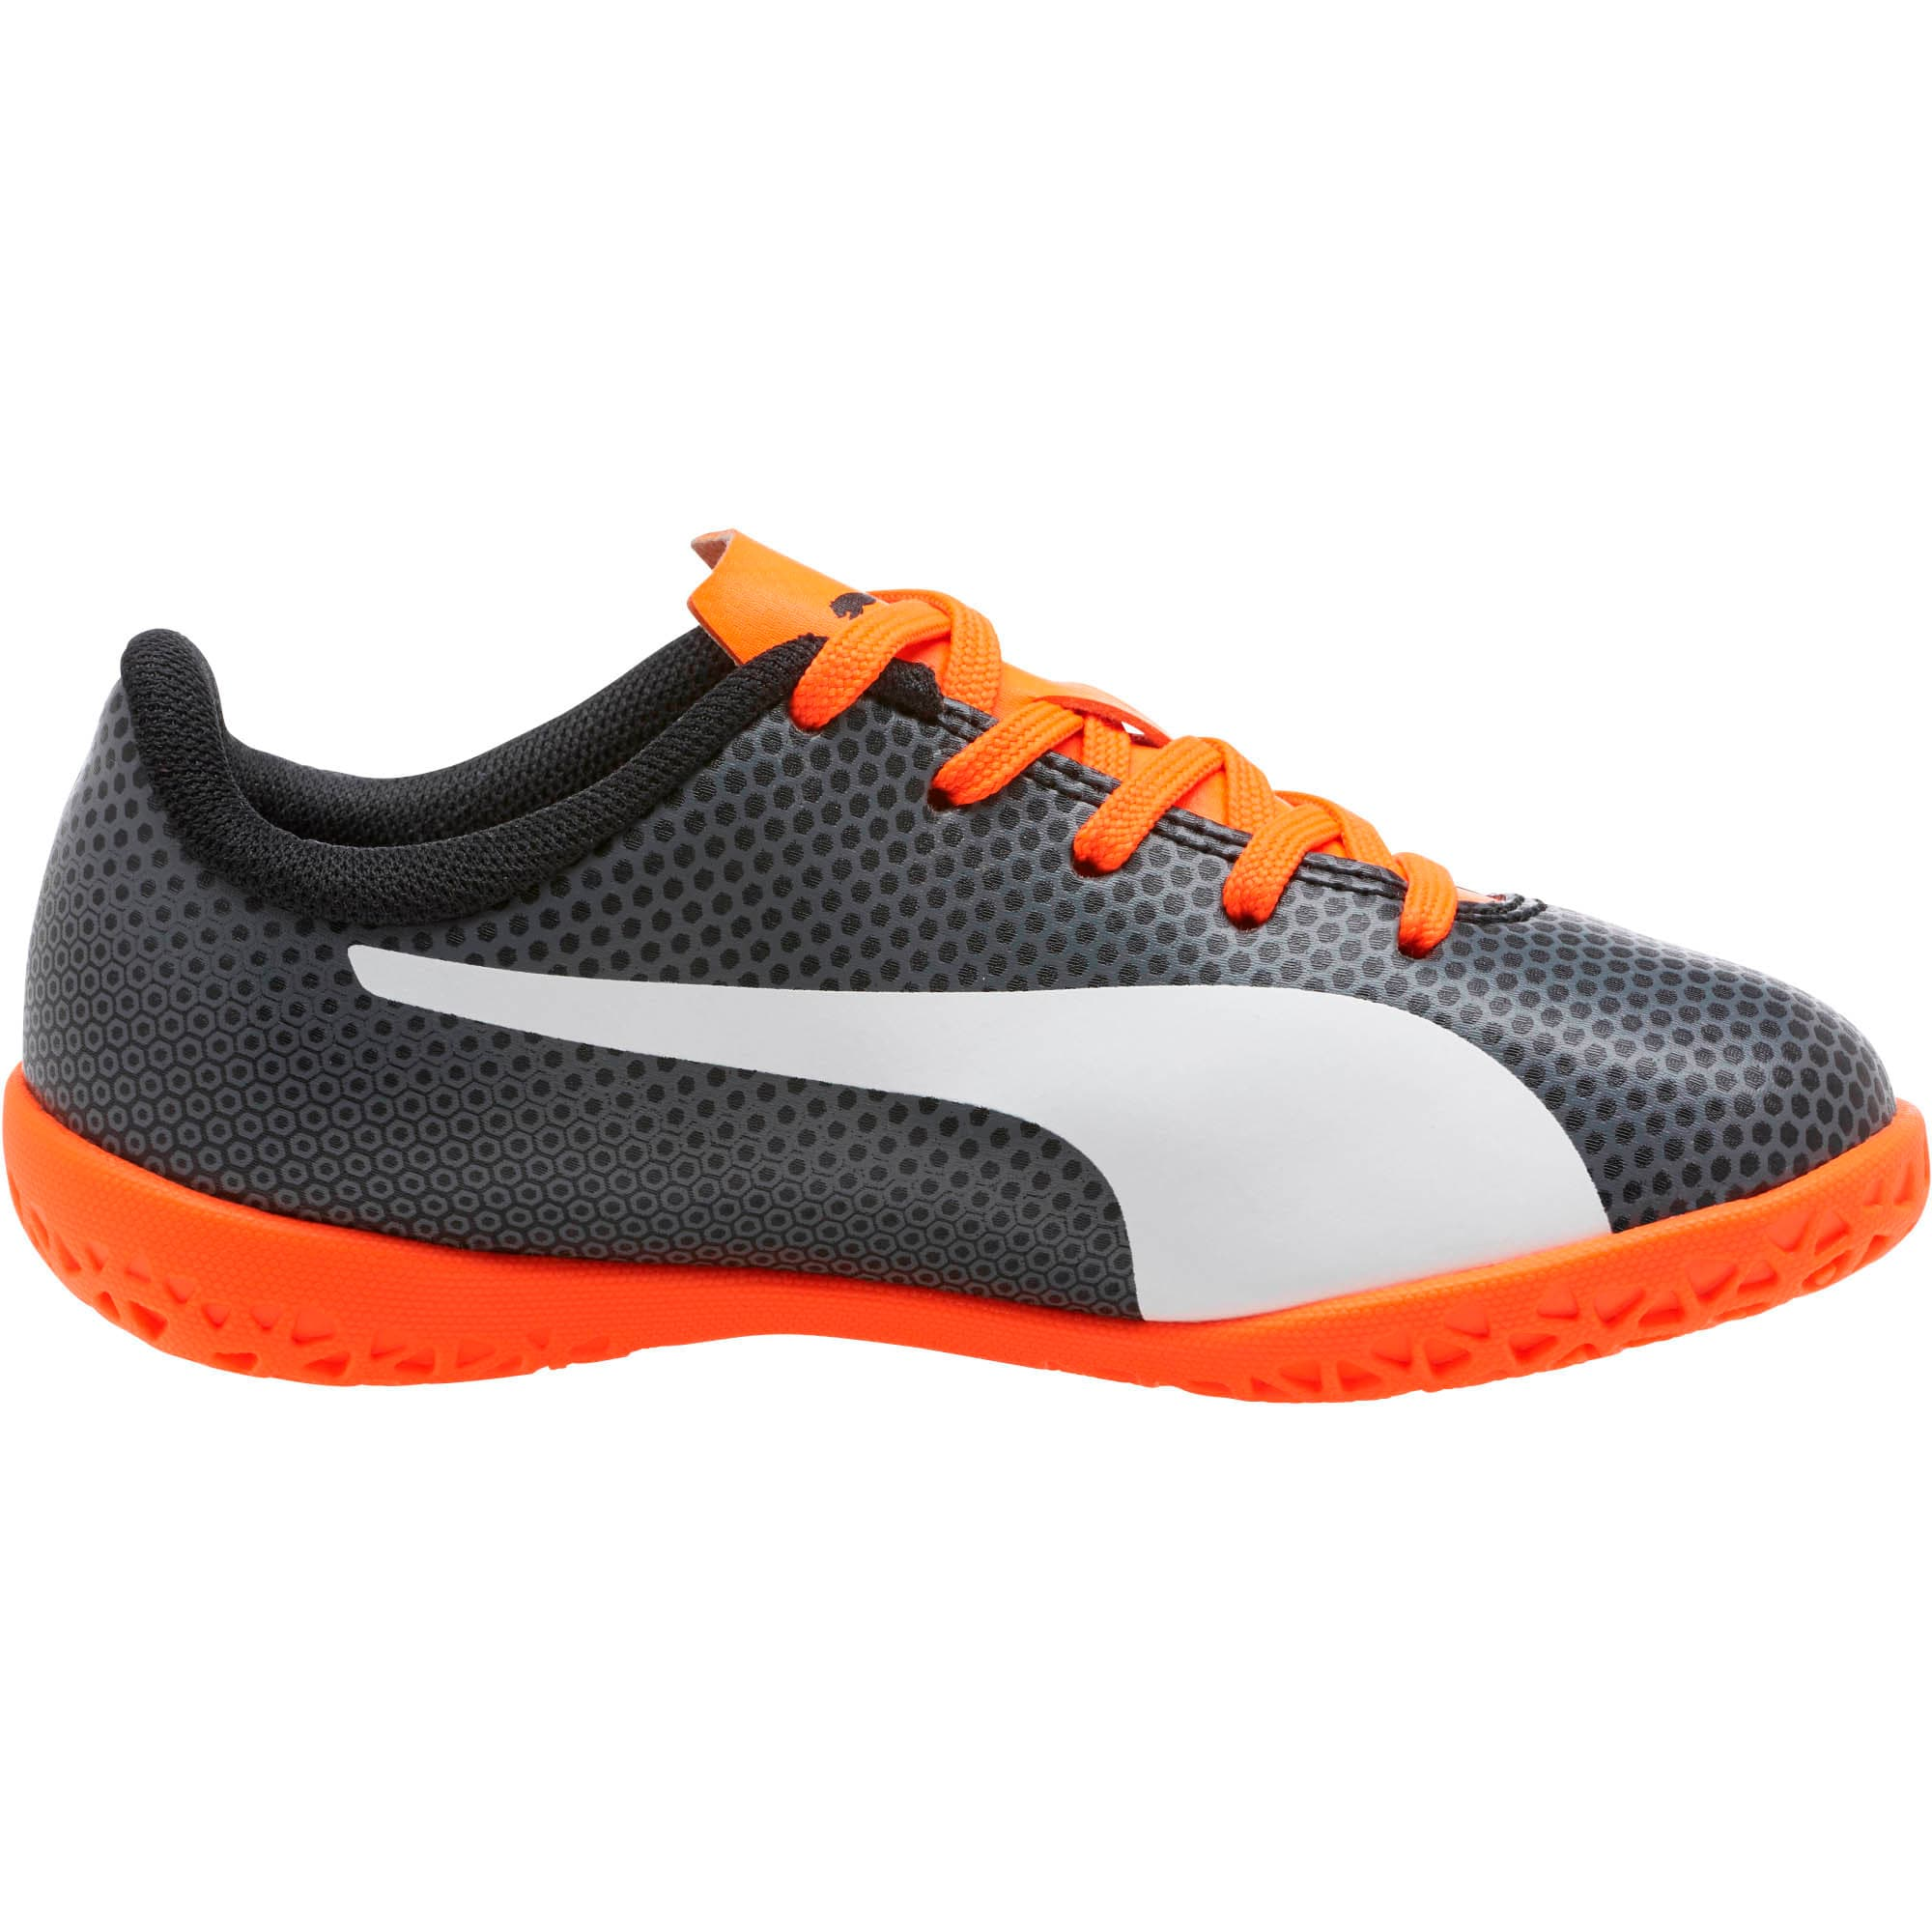 Thumbnail 3 of PUMA Spirit IT Soccer Shoes JR, Black-White-Orange, medium